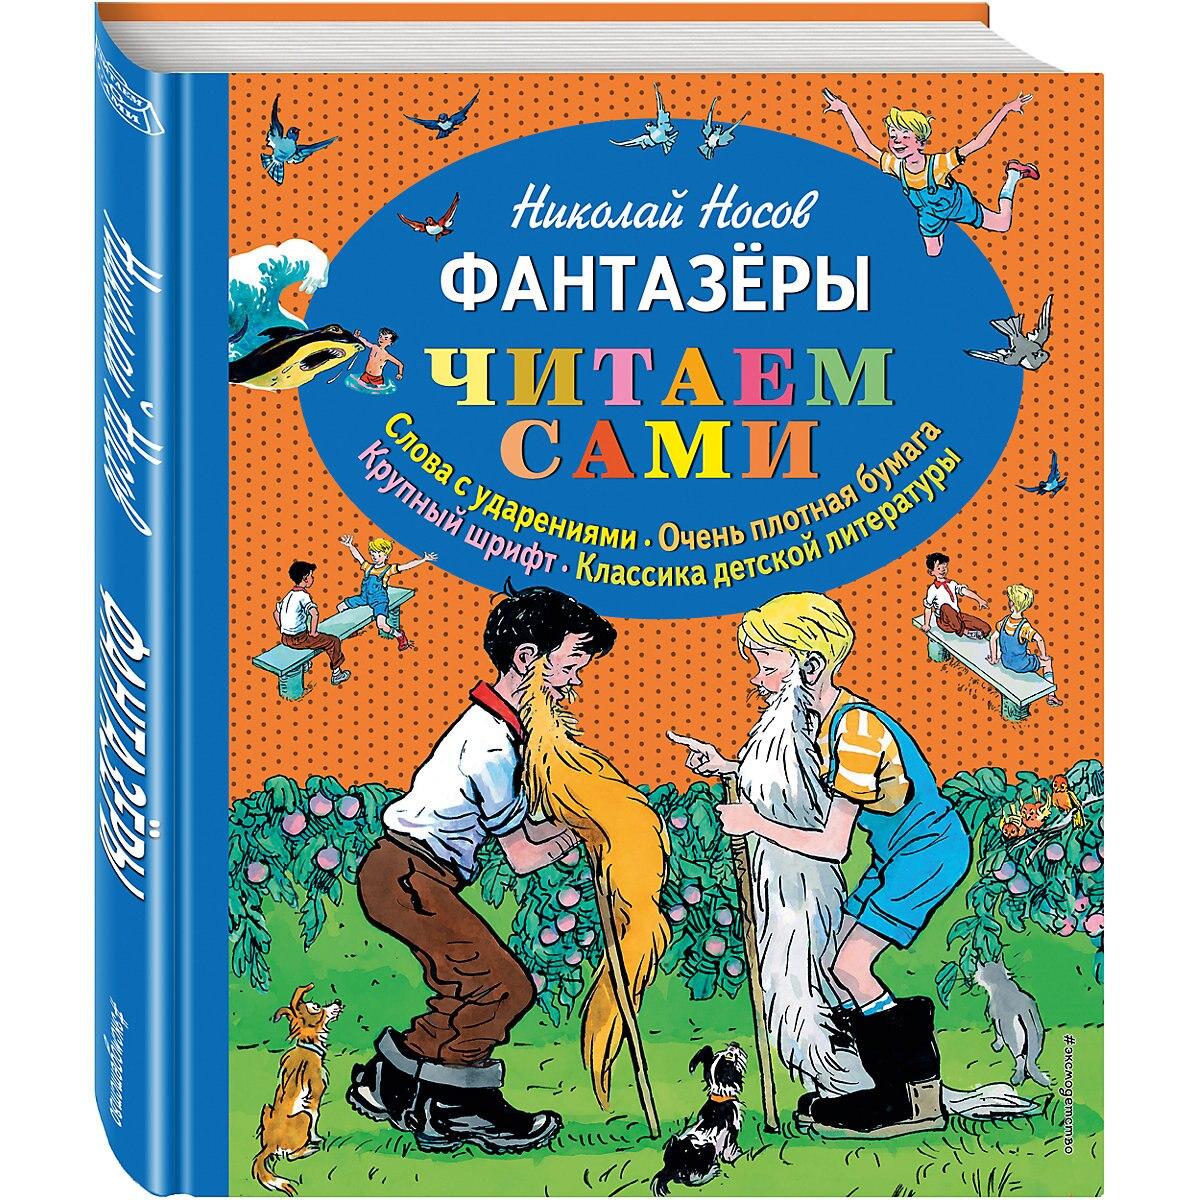 Books EKSMO 5535577 Children Education Encyclopedia Alphabet Dictionary Book For Baby MTpromo